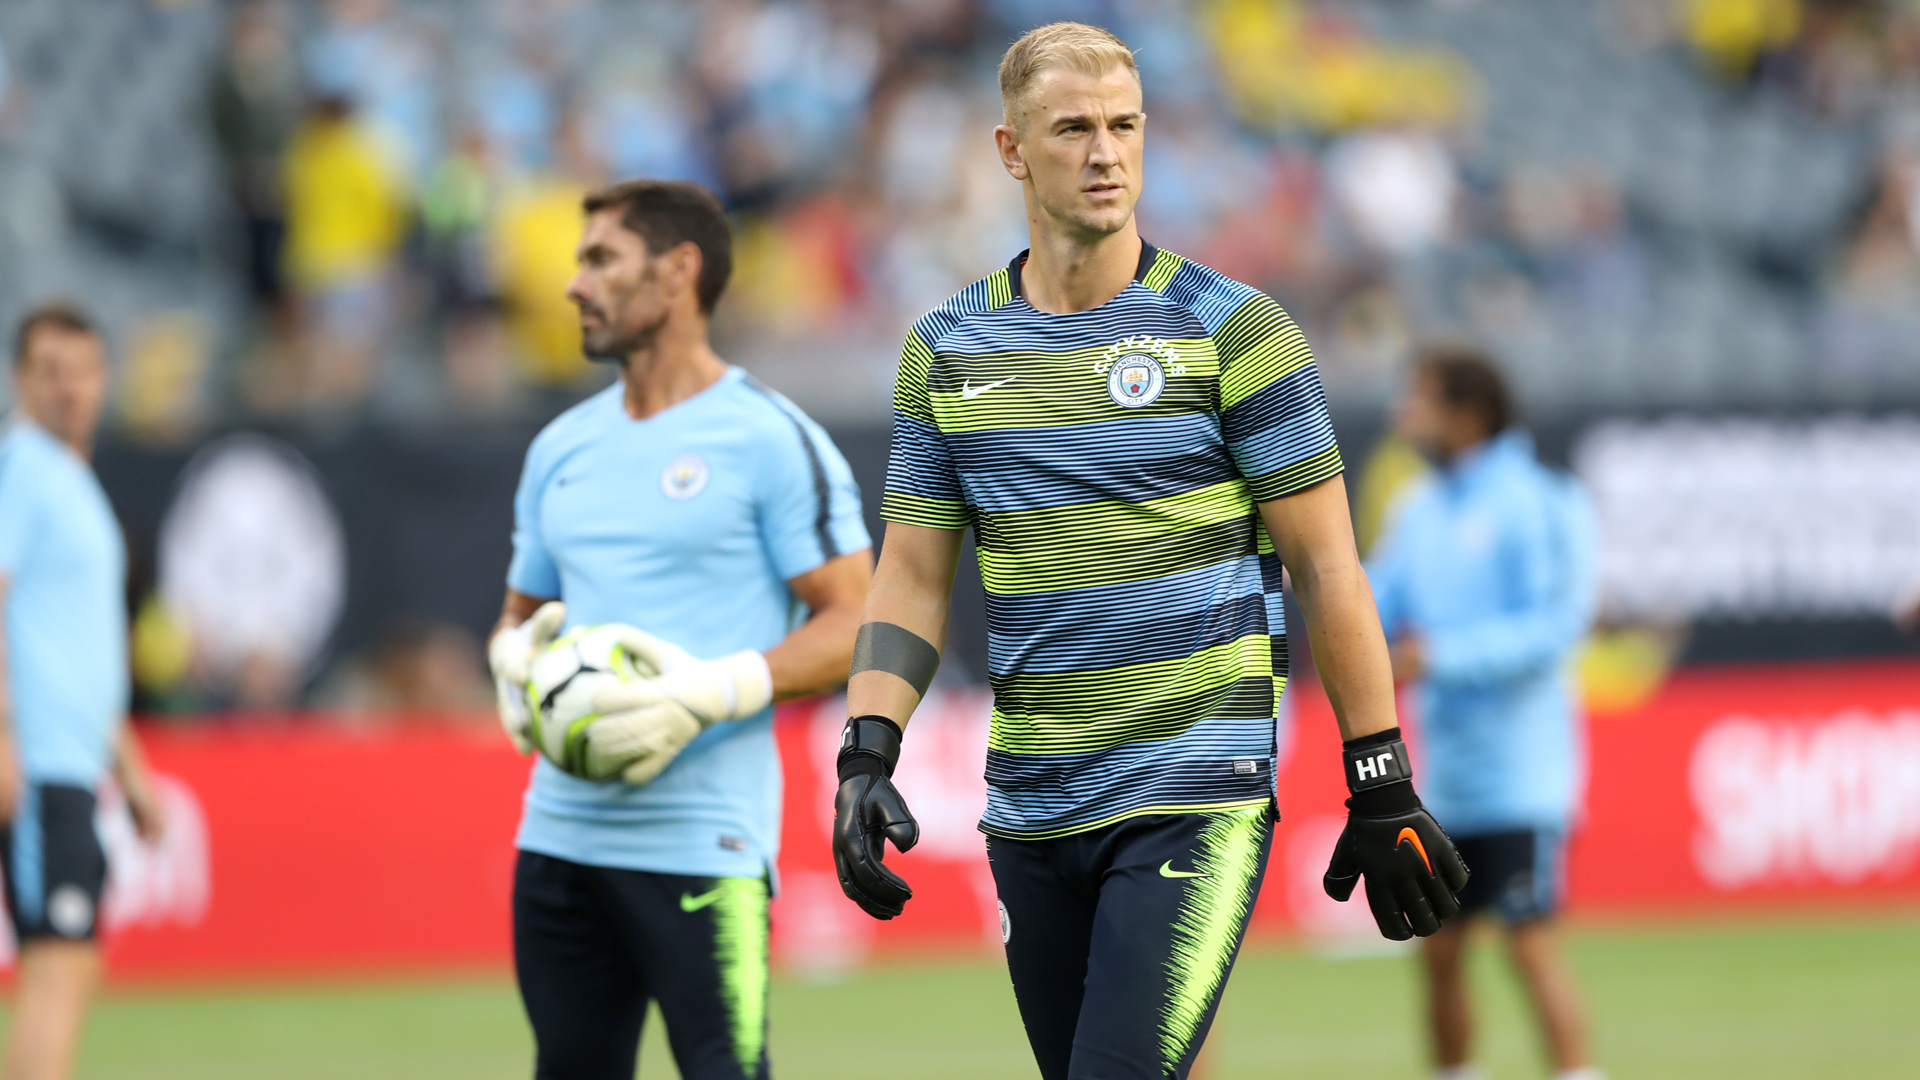 Rencana Transfer Manchester City Menyempurnakan